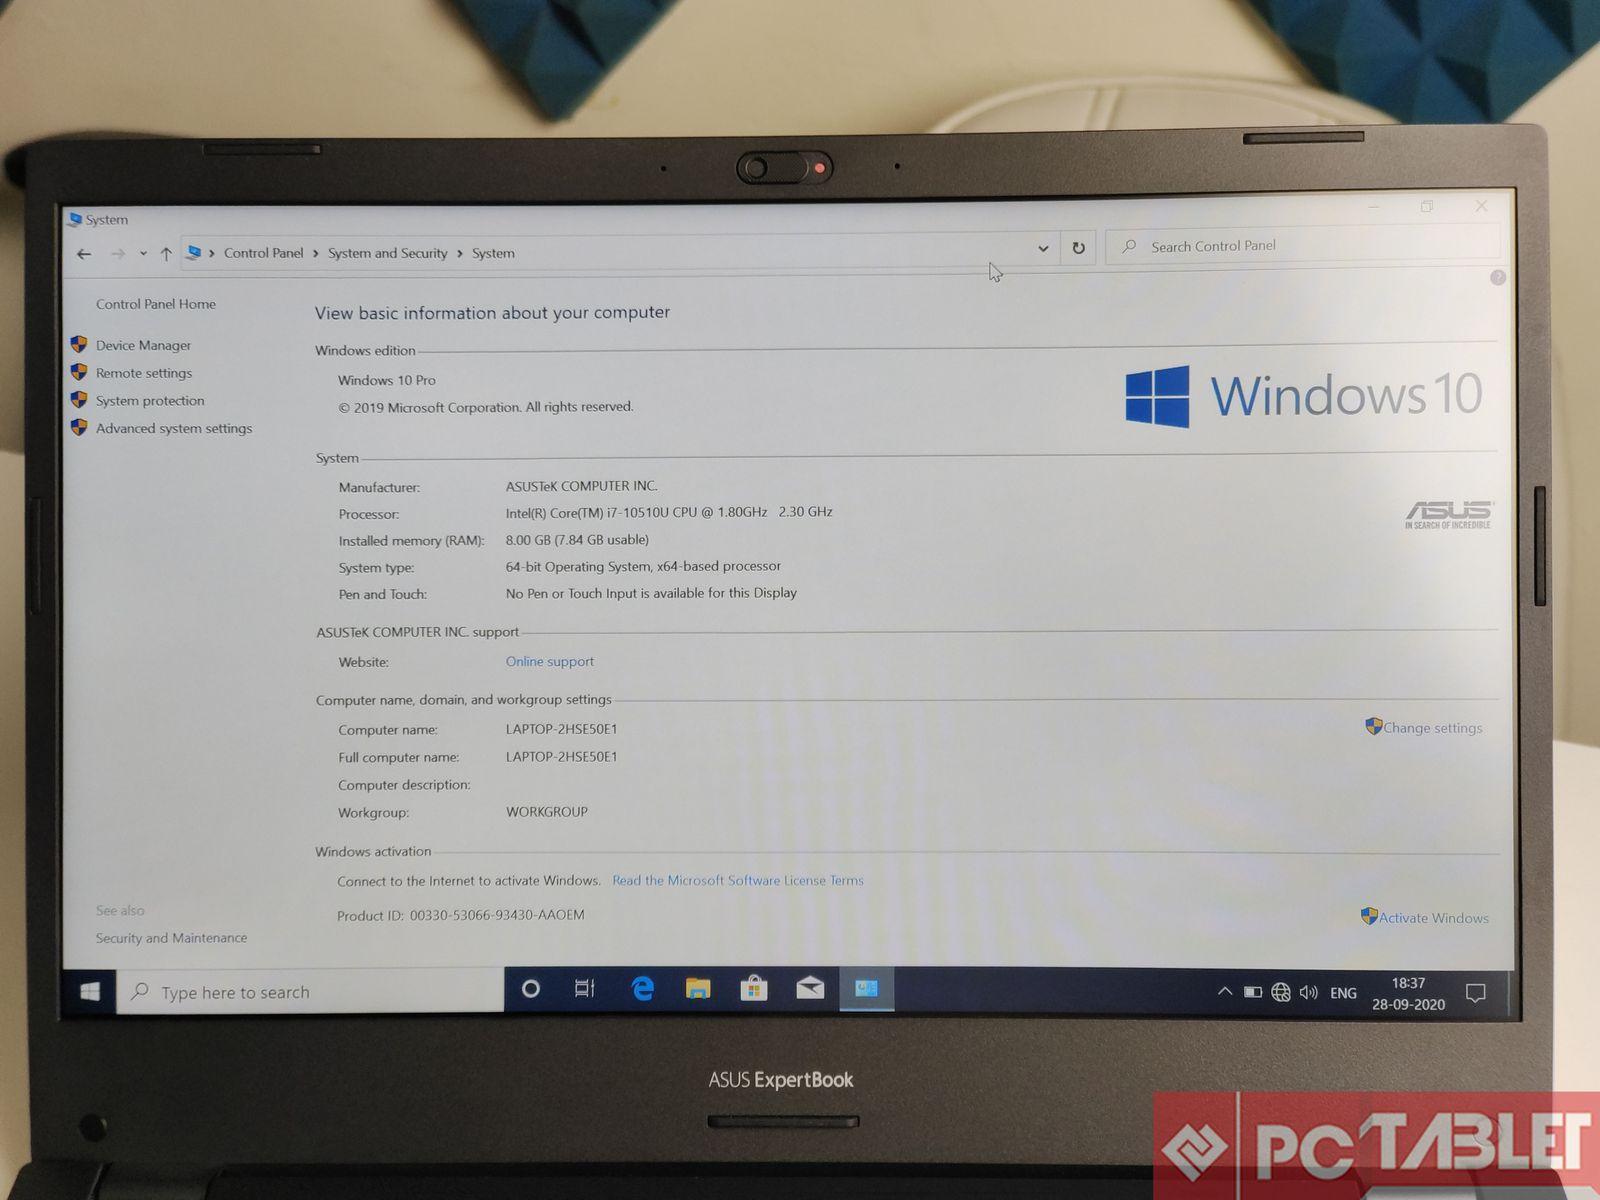 Asus ExpertBook P2451F laptop Review 11